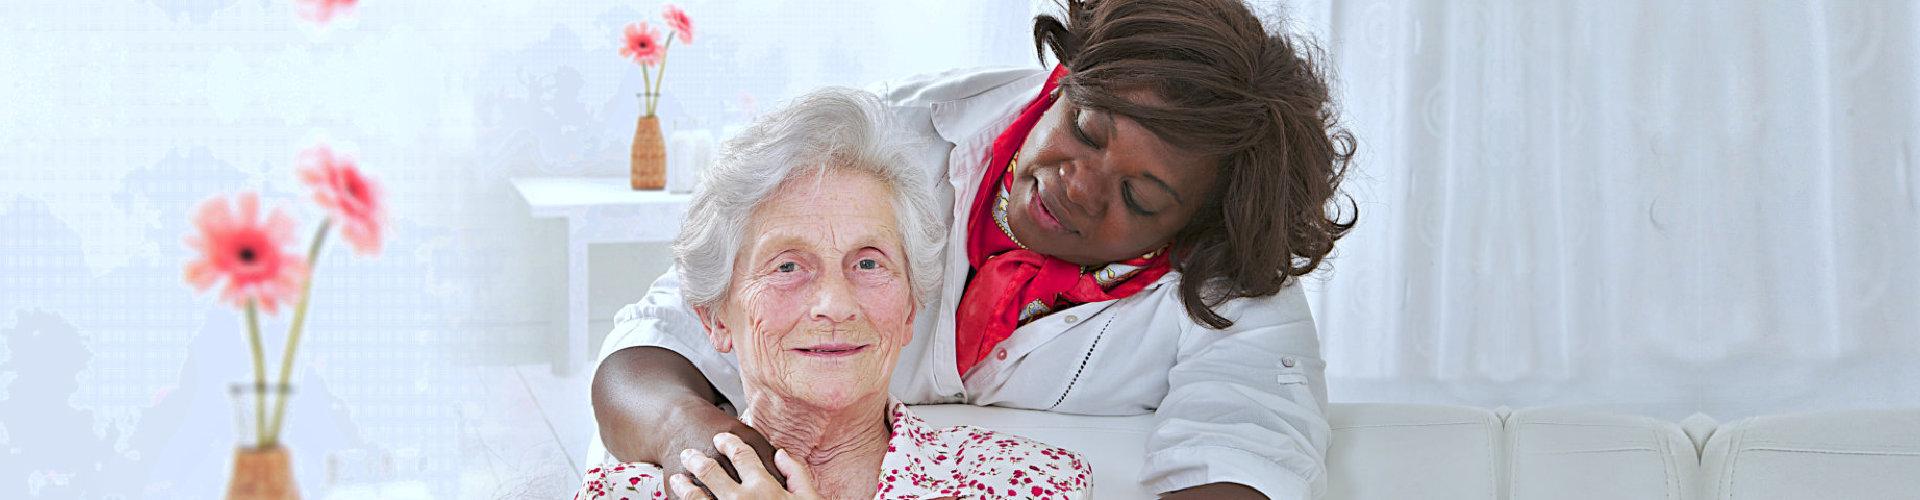 senior woman smiling while her caregiver watching